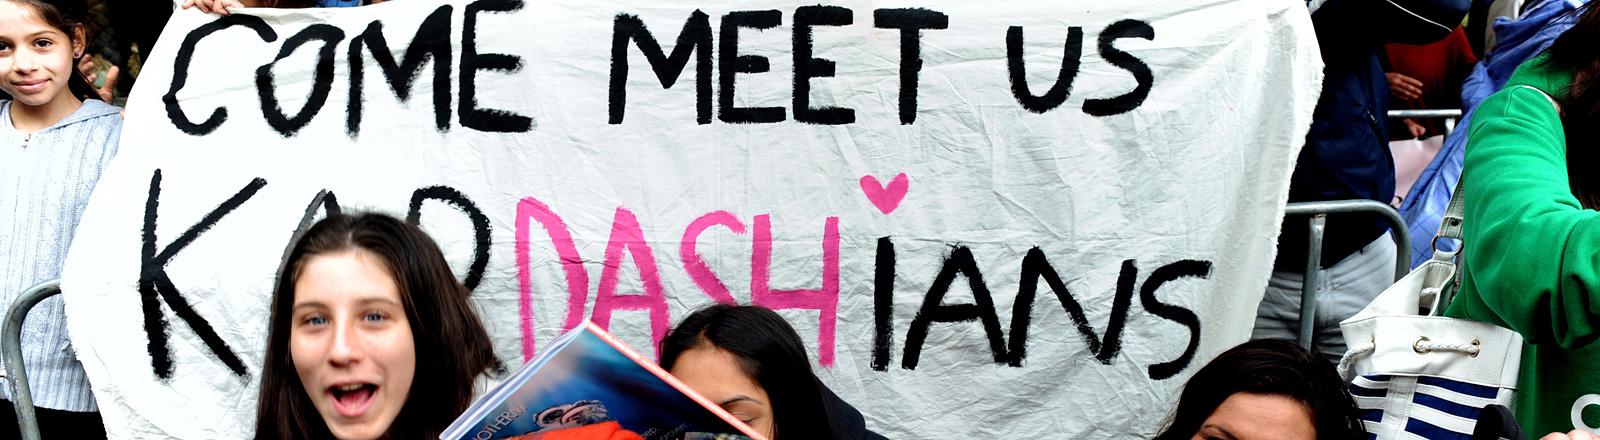 Kardashian-Fans mit Banner